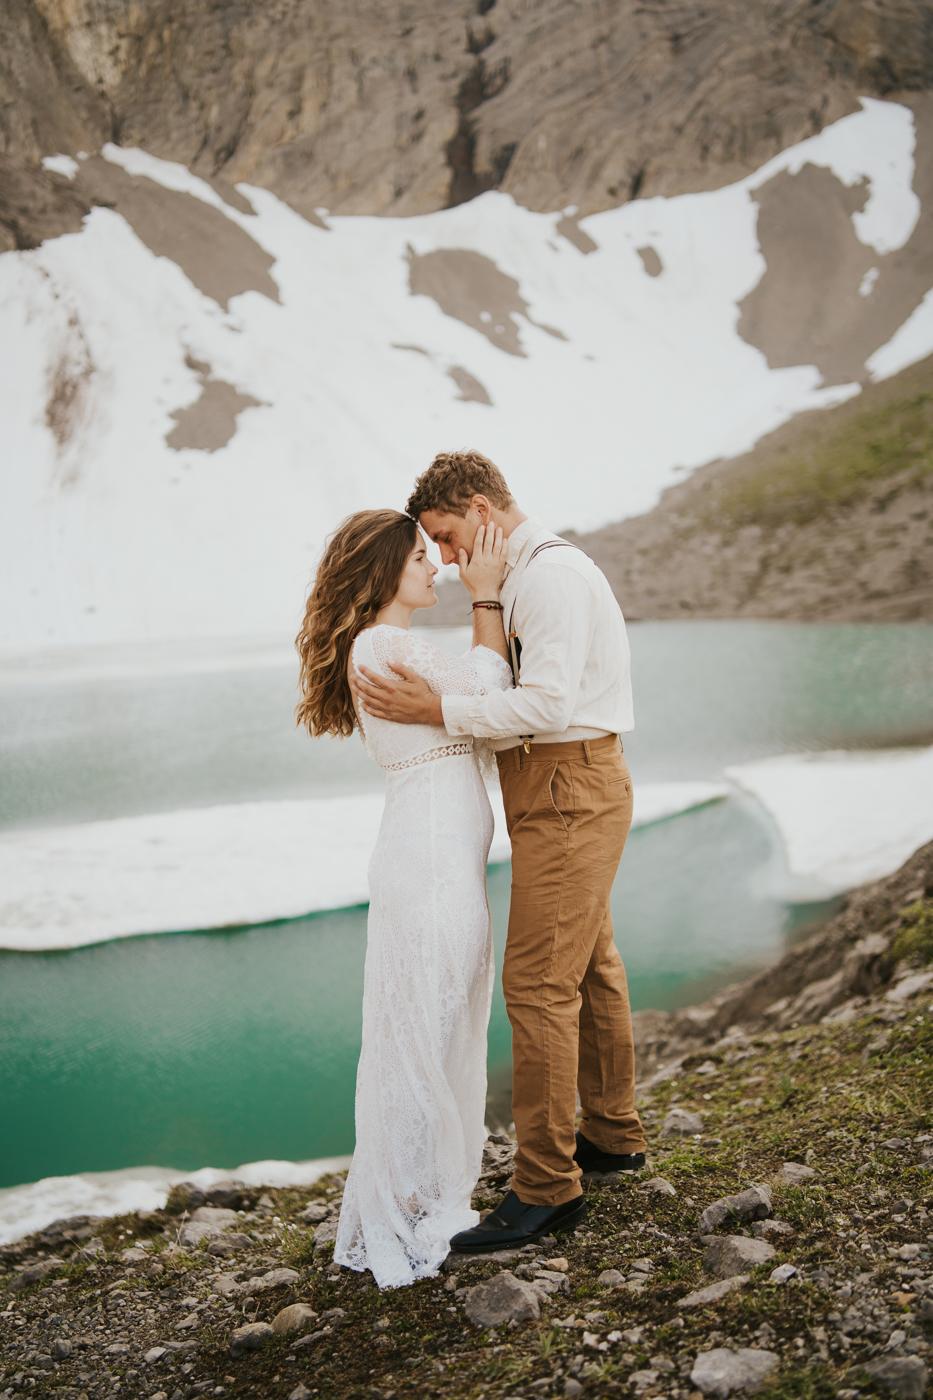 tyraephotography_photographer_wedding_elopement_engagement_photography-07593.jpg